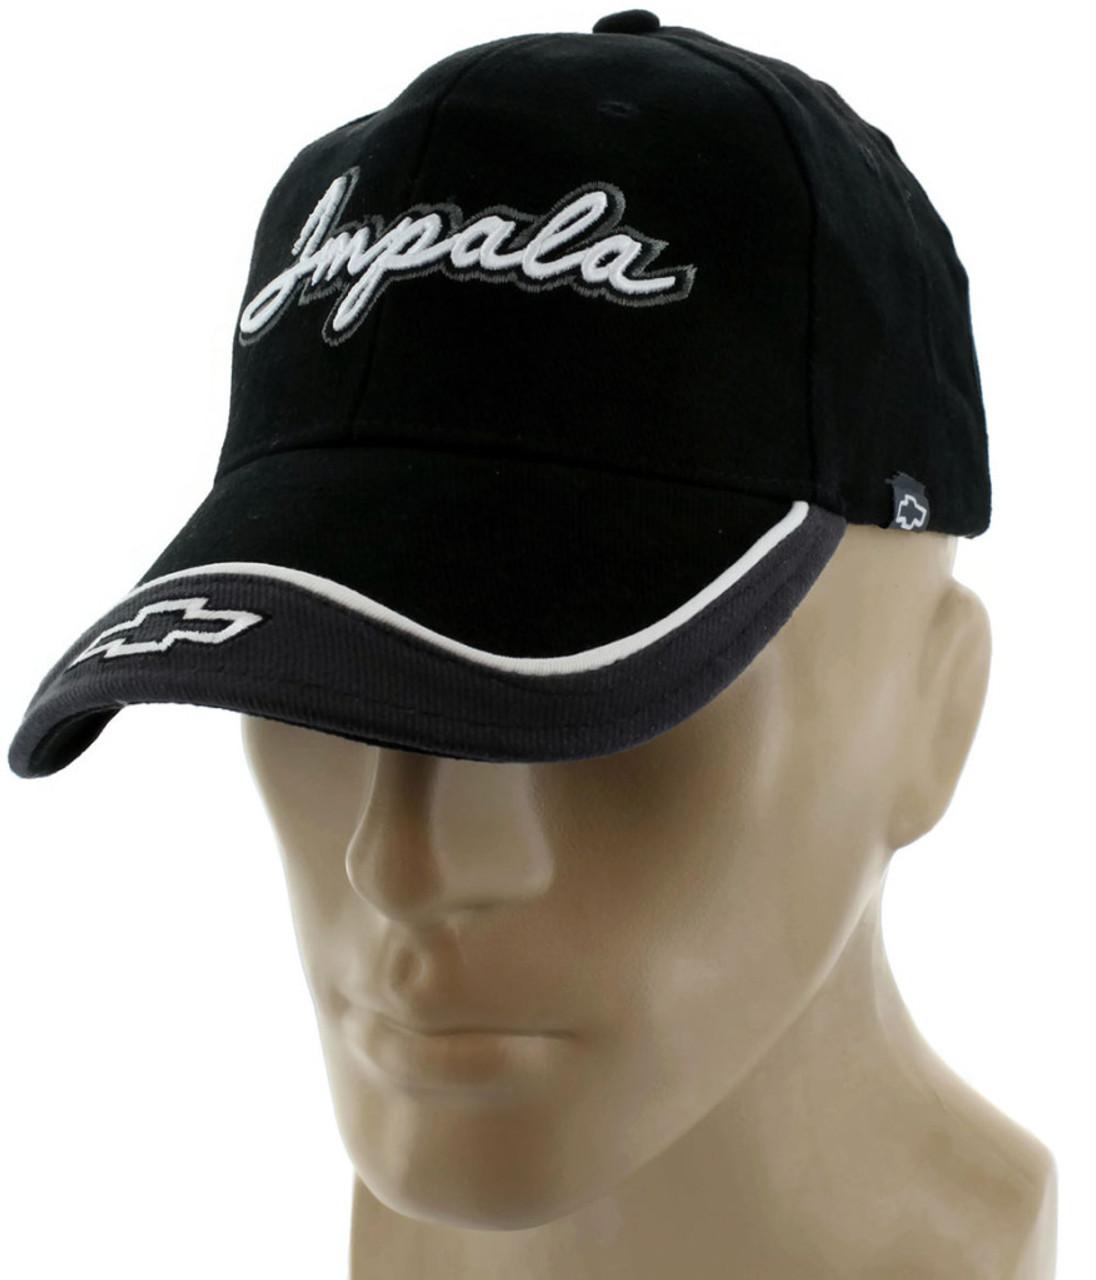 Chevy Chevrolet Impala Gray Baseball Cap Trucker Hat Snapback Logo ... f819401ecdd